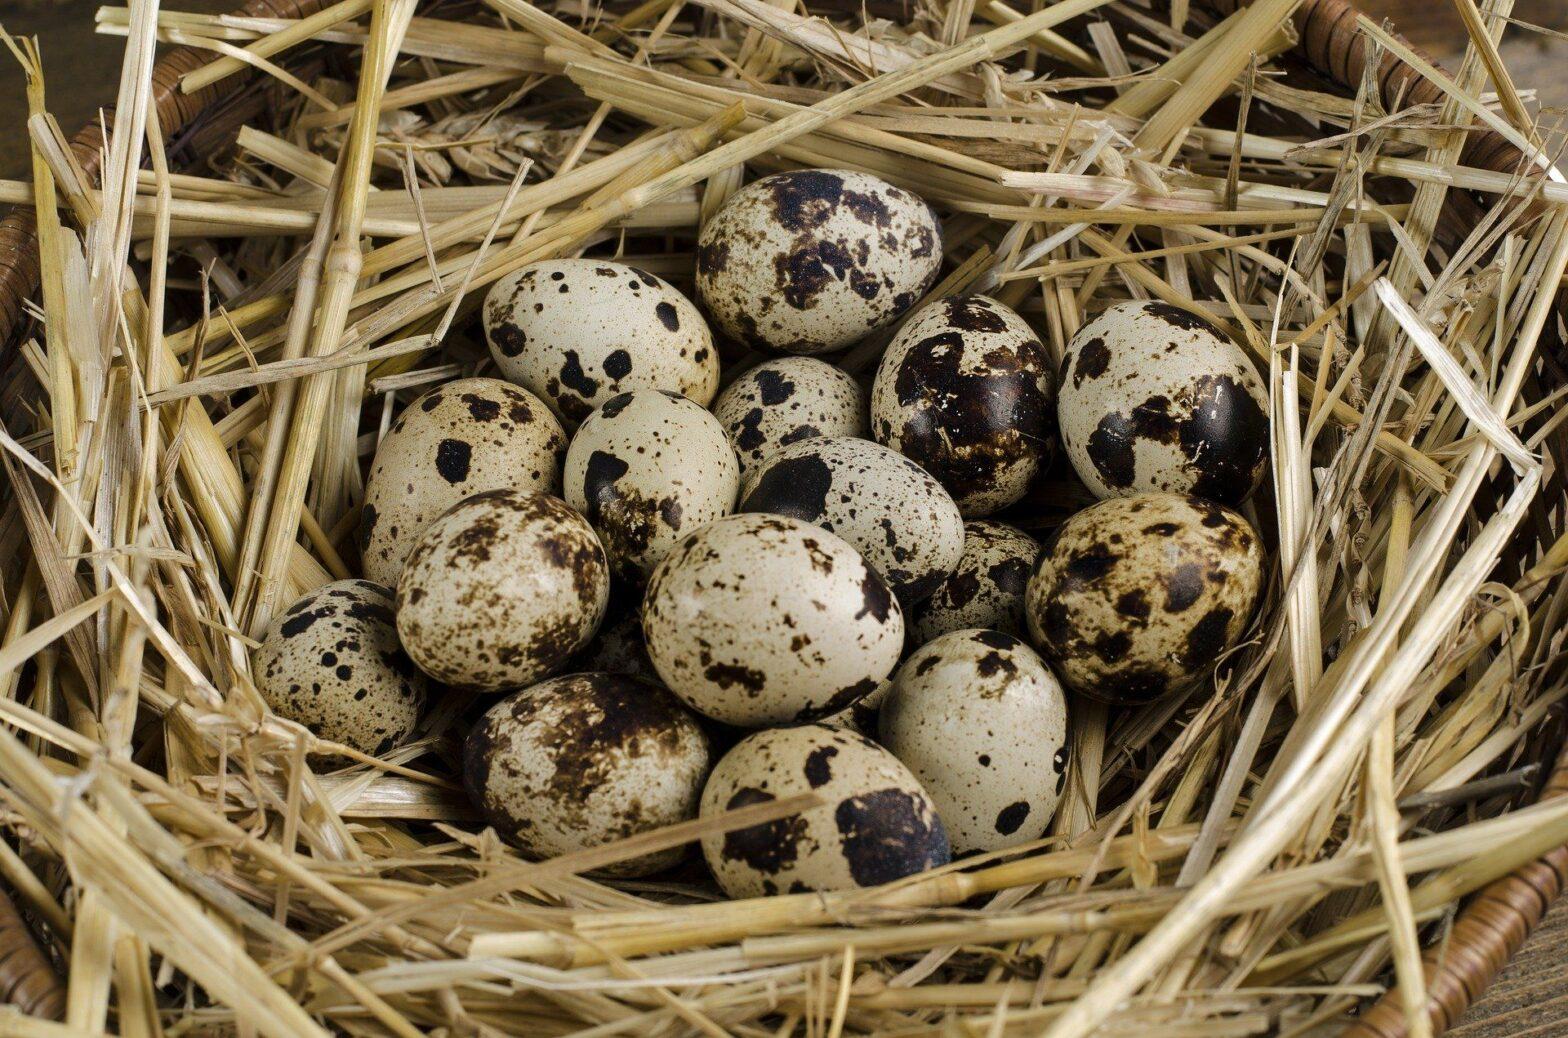 resep-semur-telur-yang-enak